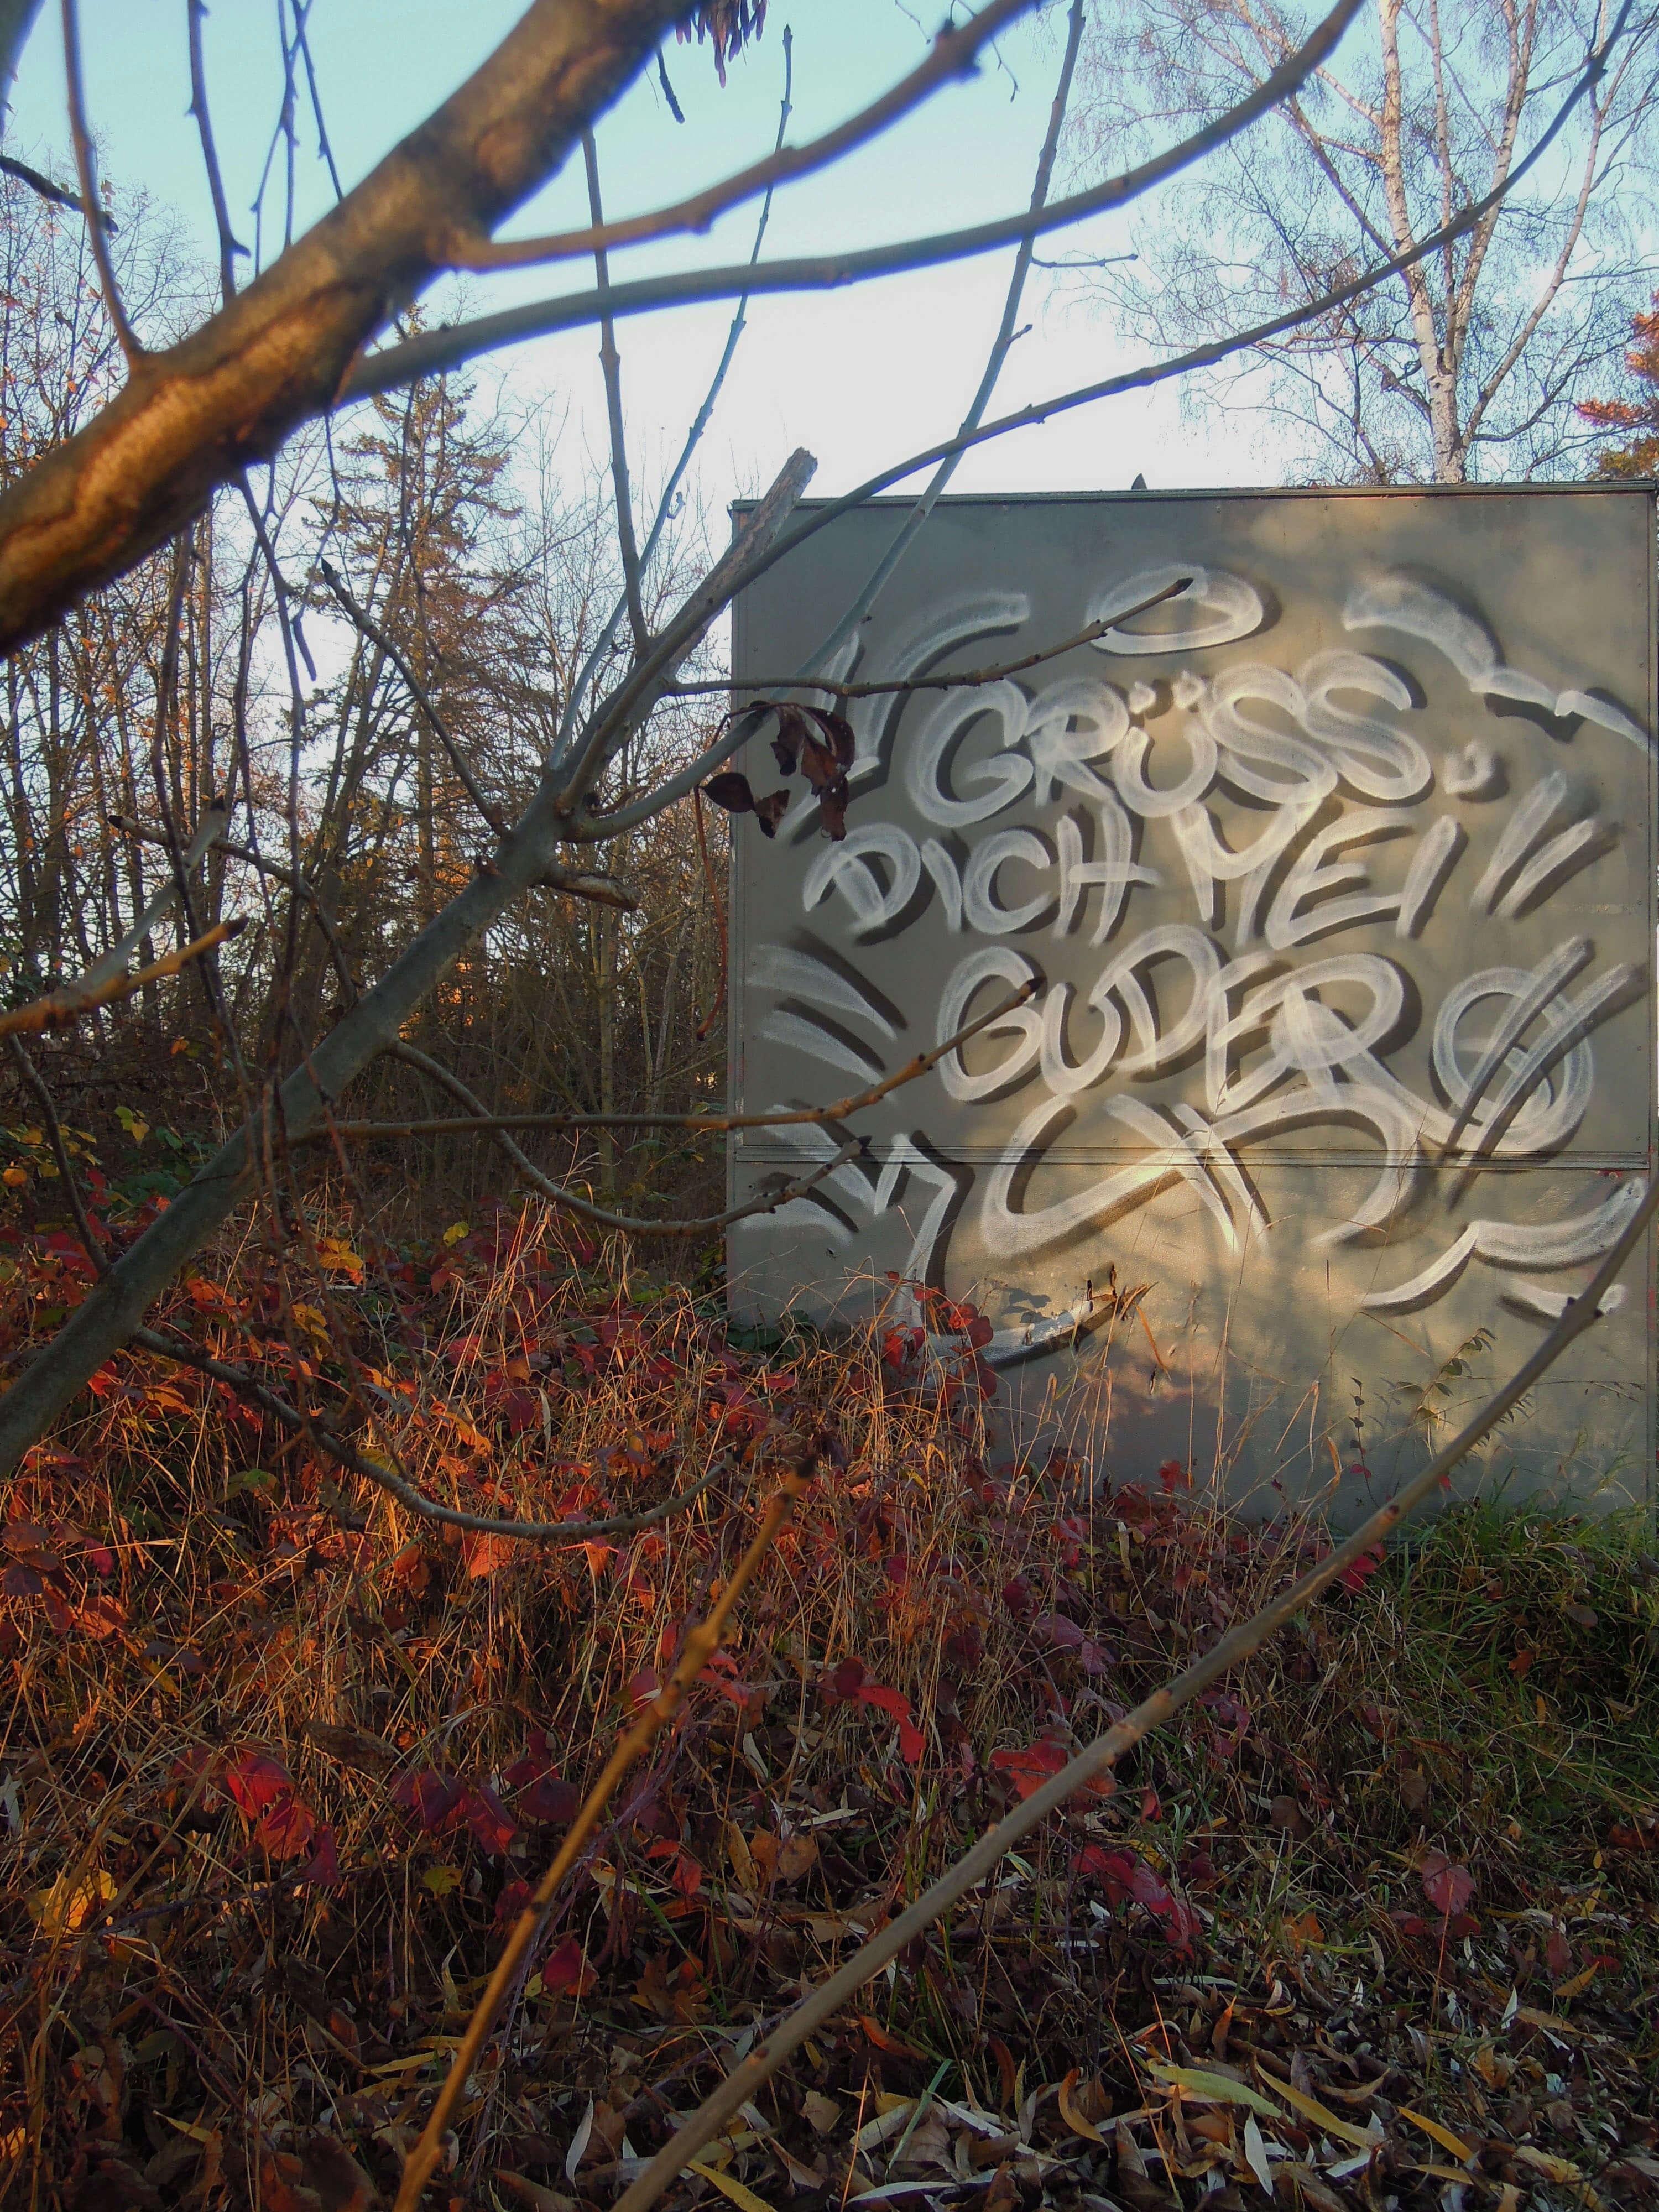 Vegetation. Kunst und so - Grüß dich mei Guder. Street Art. Graffiti Coburg. JDE TDN CSW GDMG!